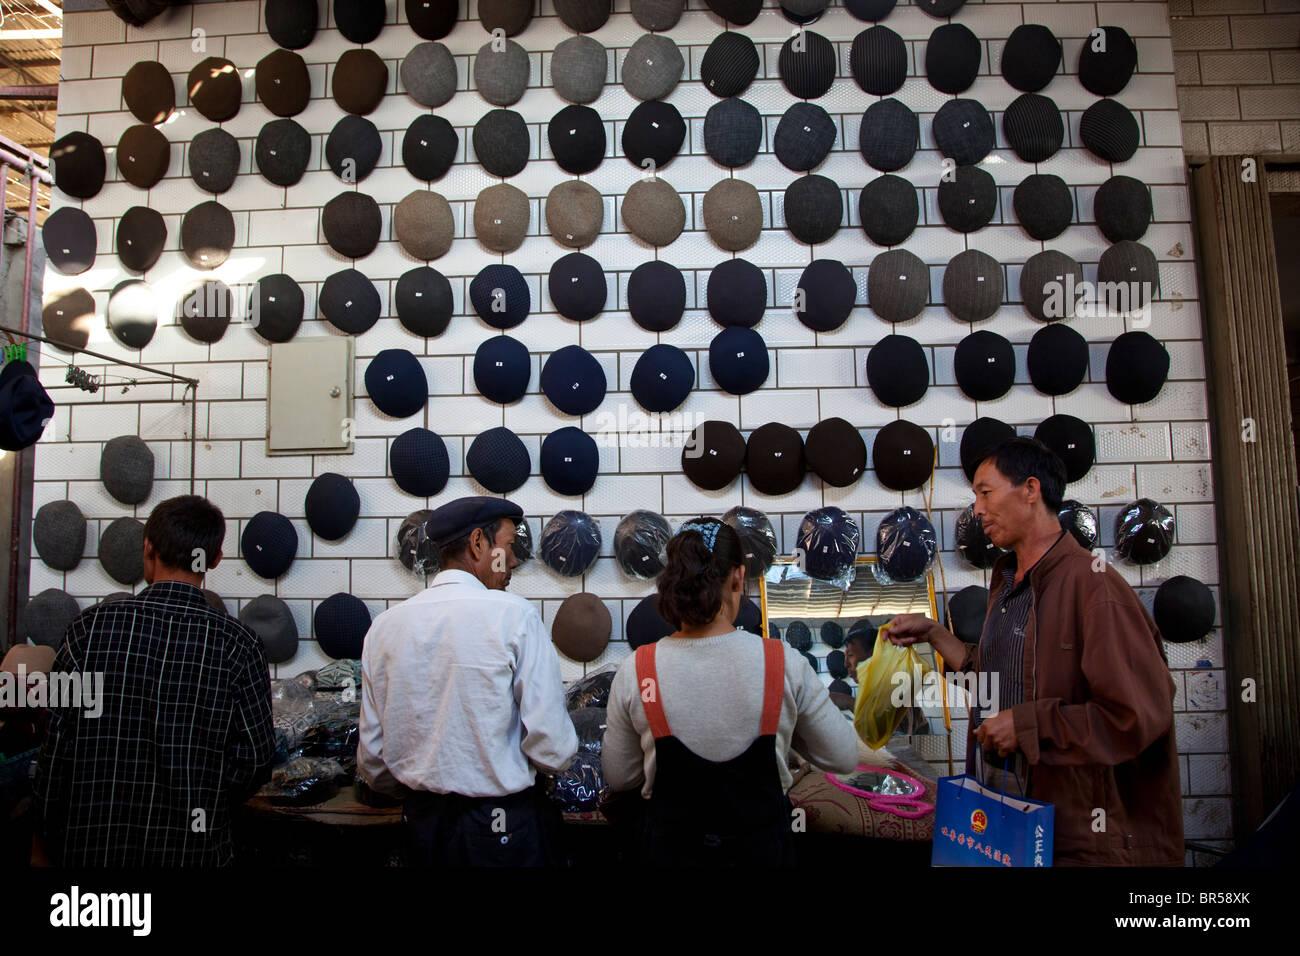 Hats for sale at bazaar in Turpan Xinjiang China. - Stock Image